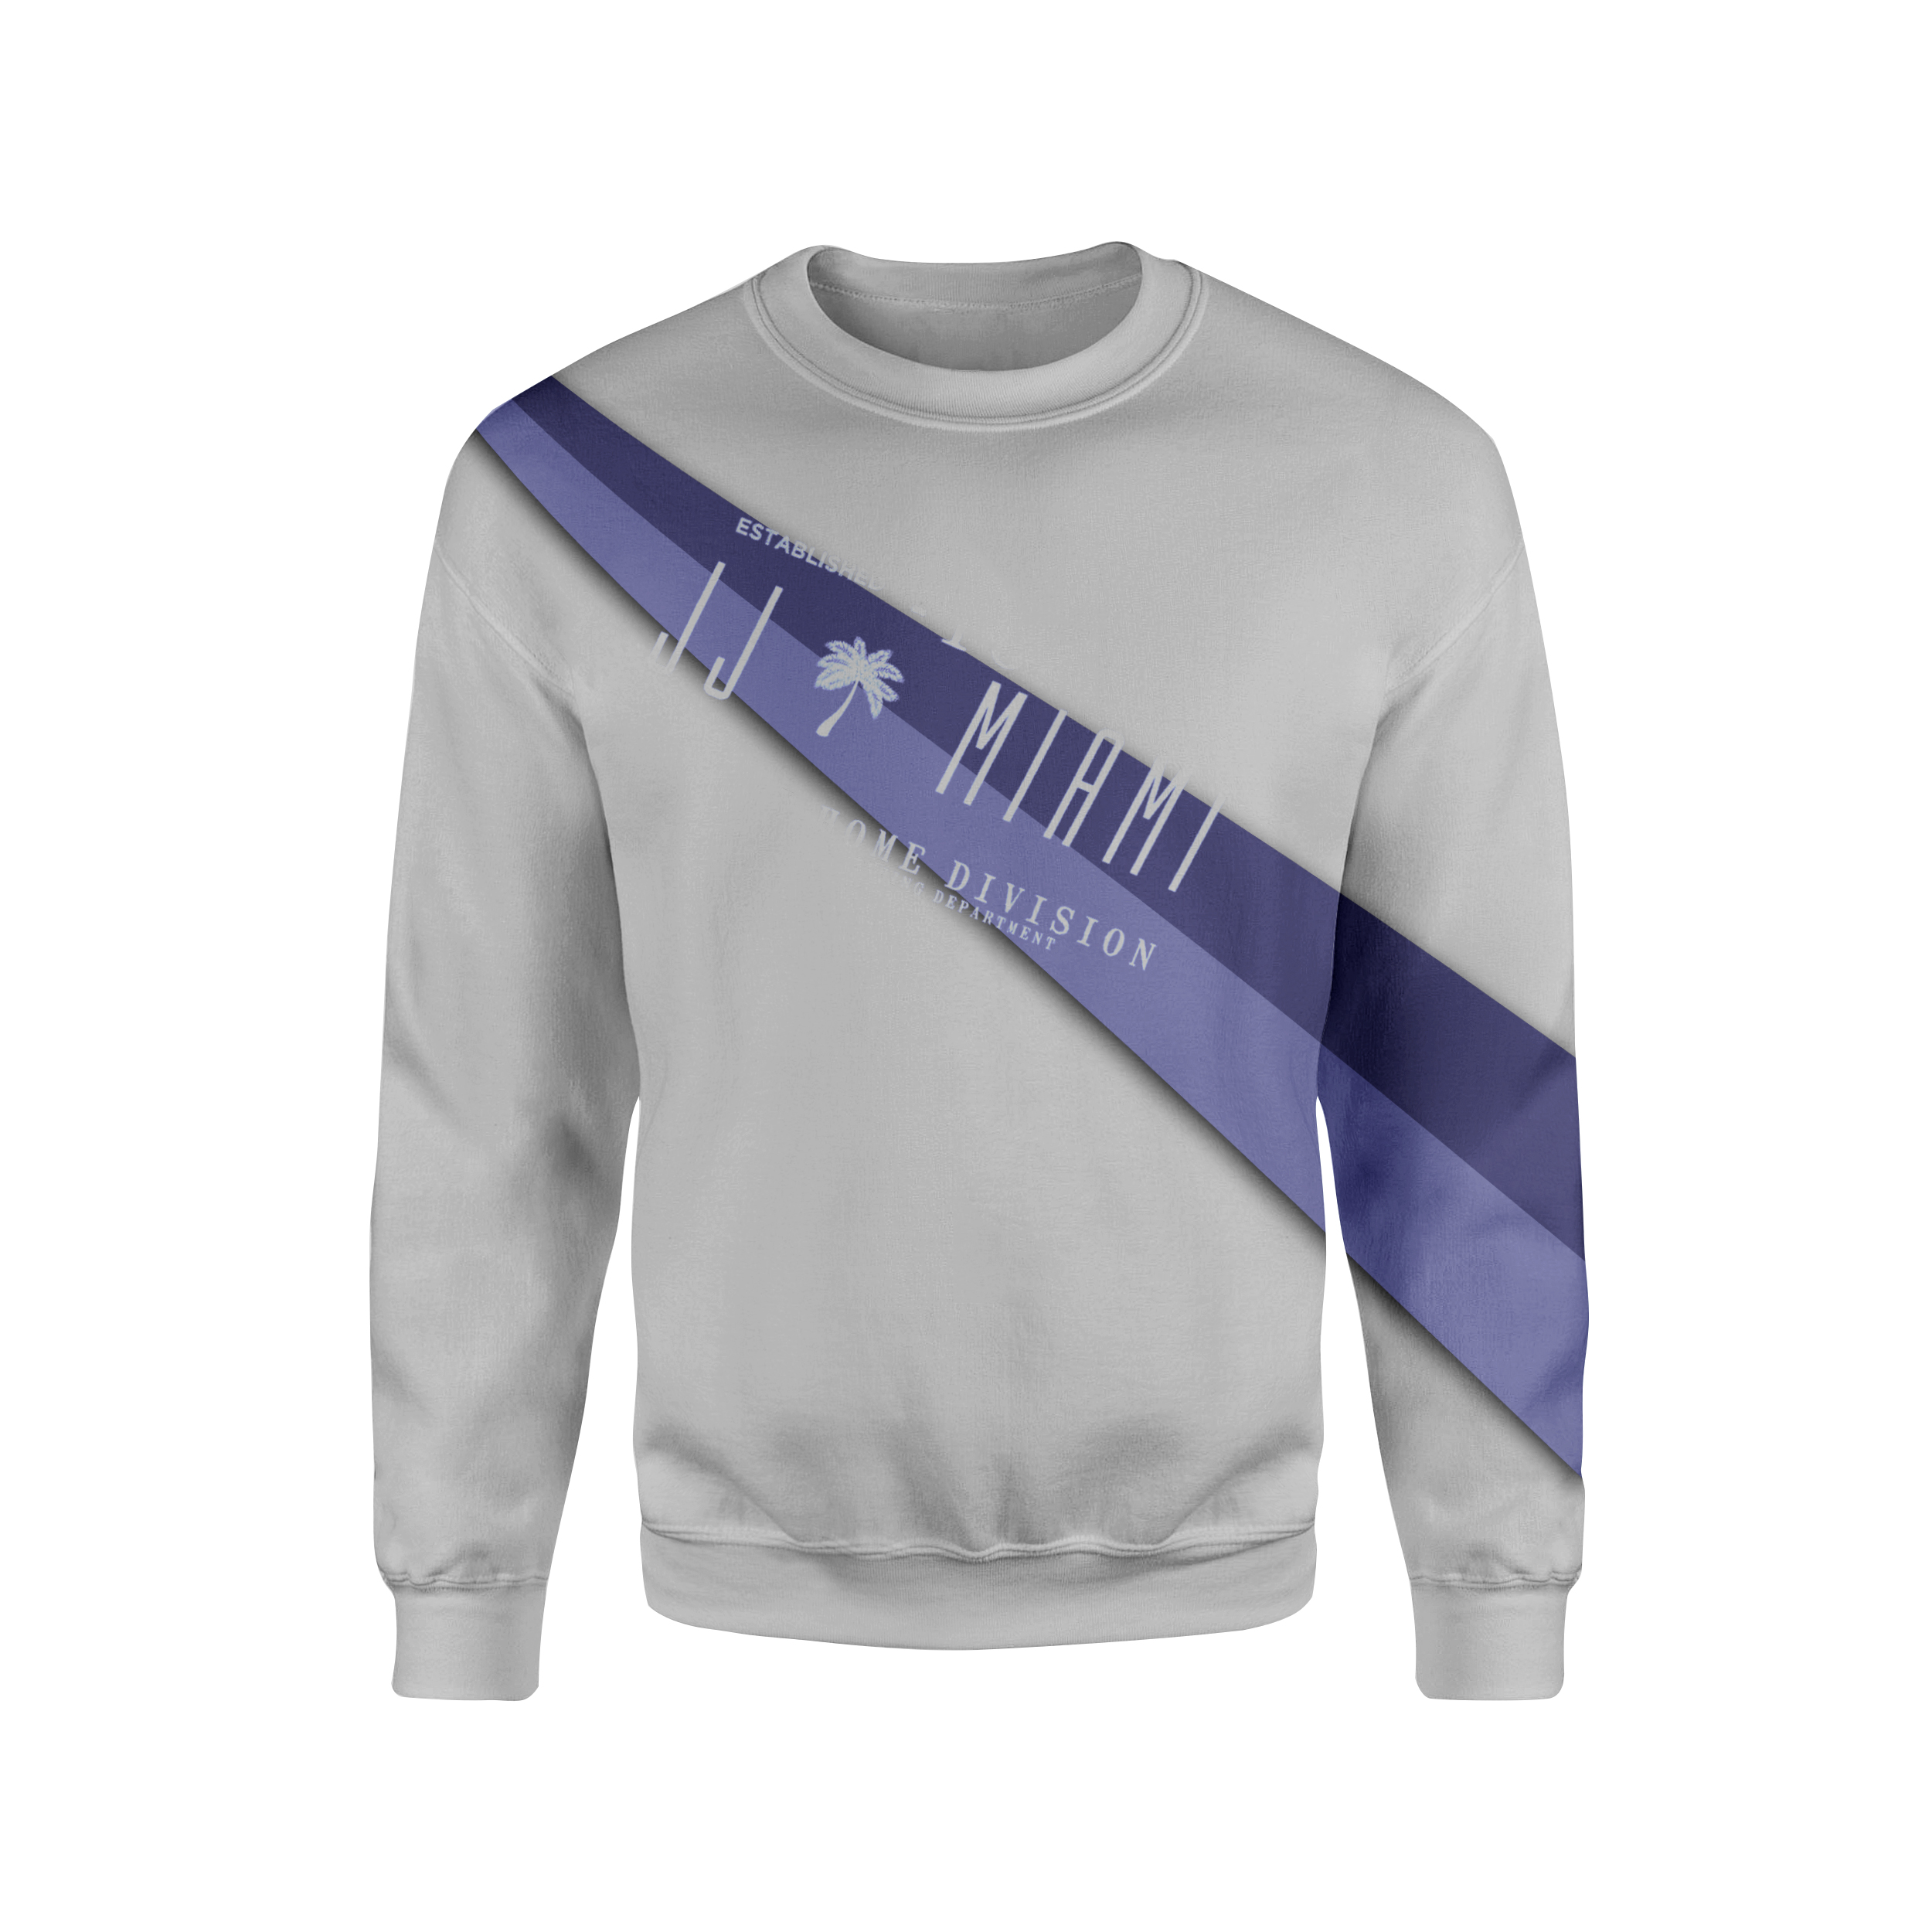 JJ_Miami_sweater_2_stripes.jpg